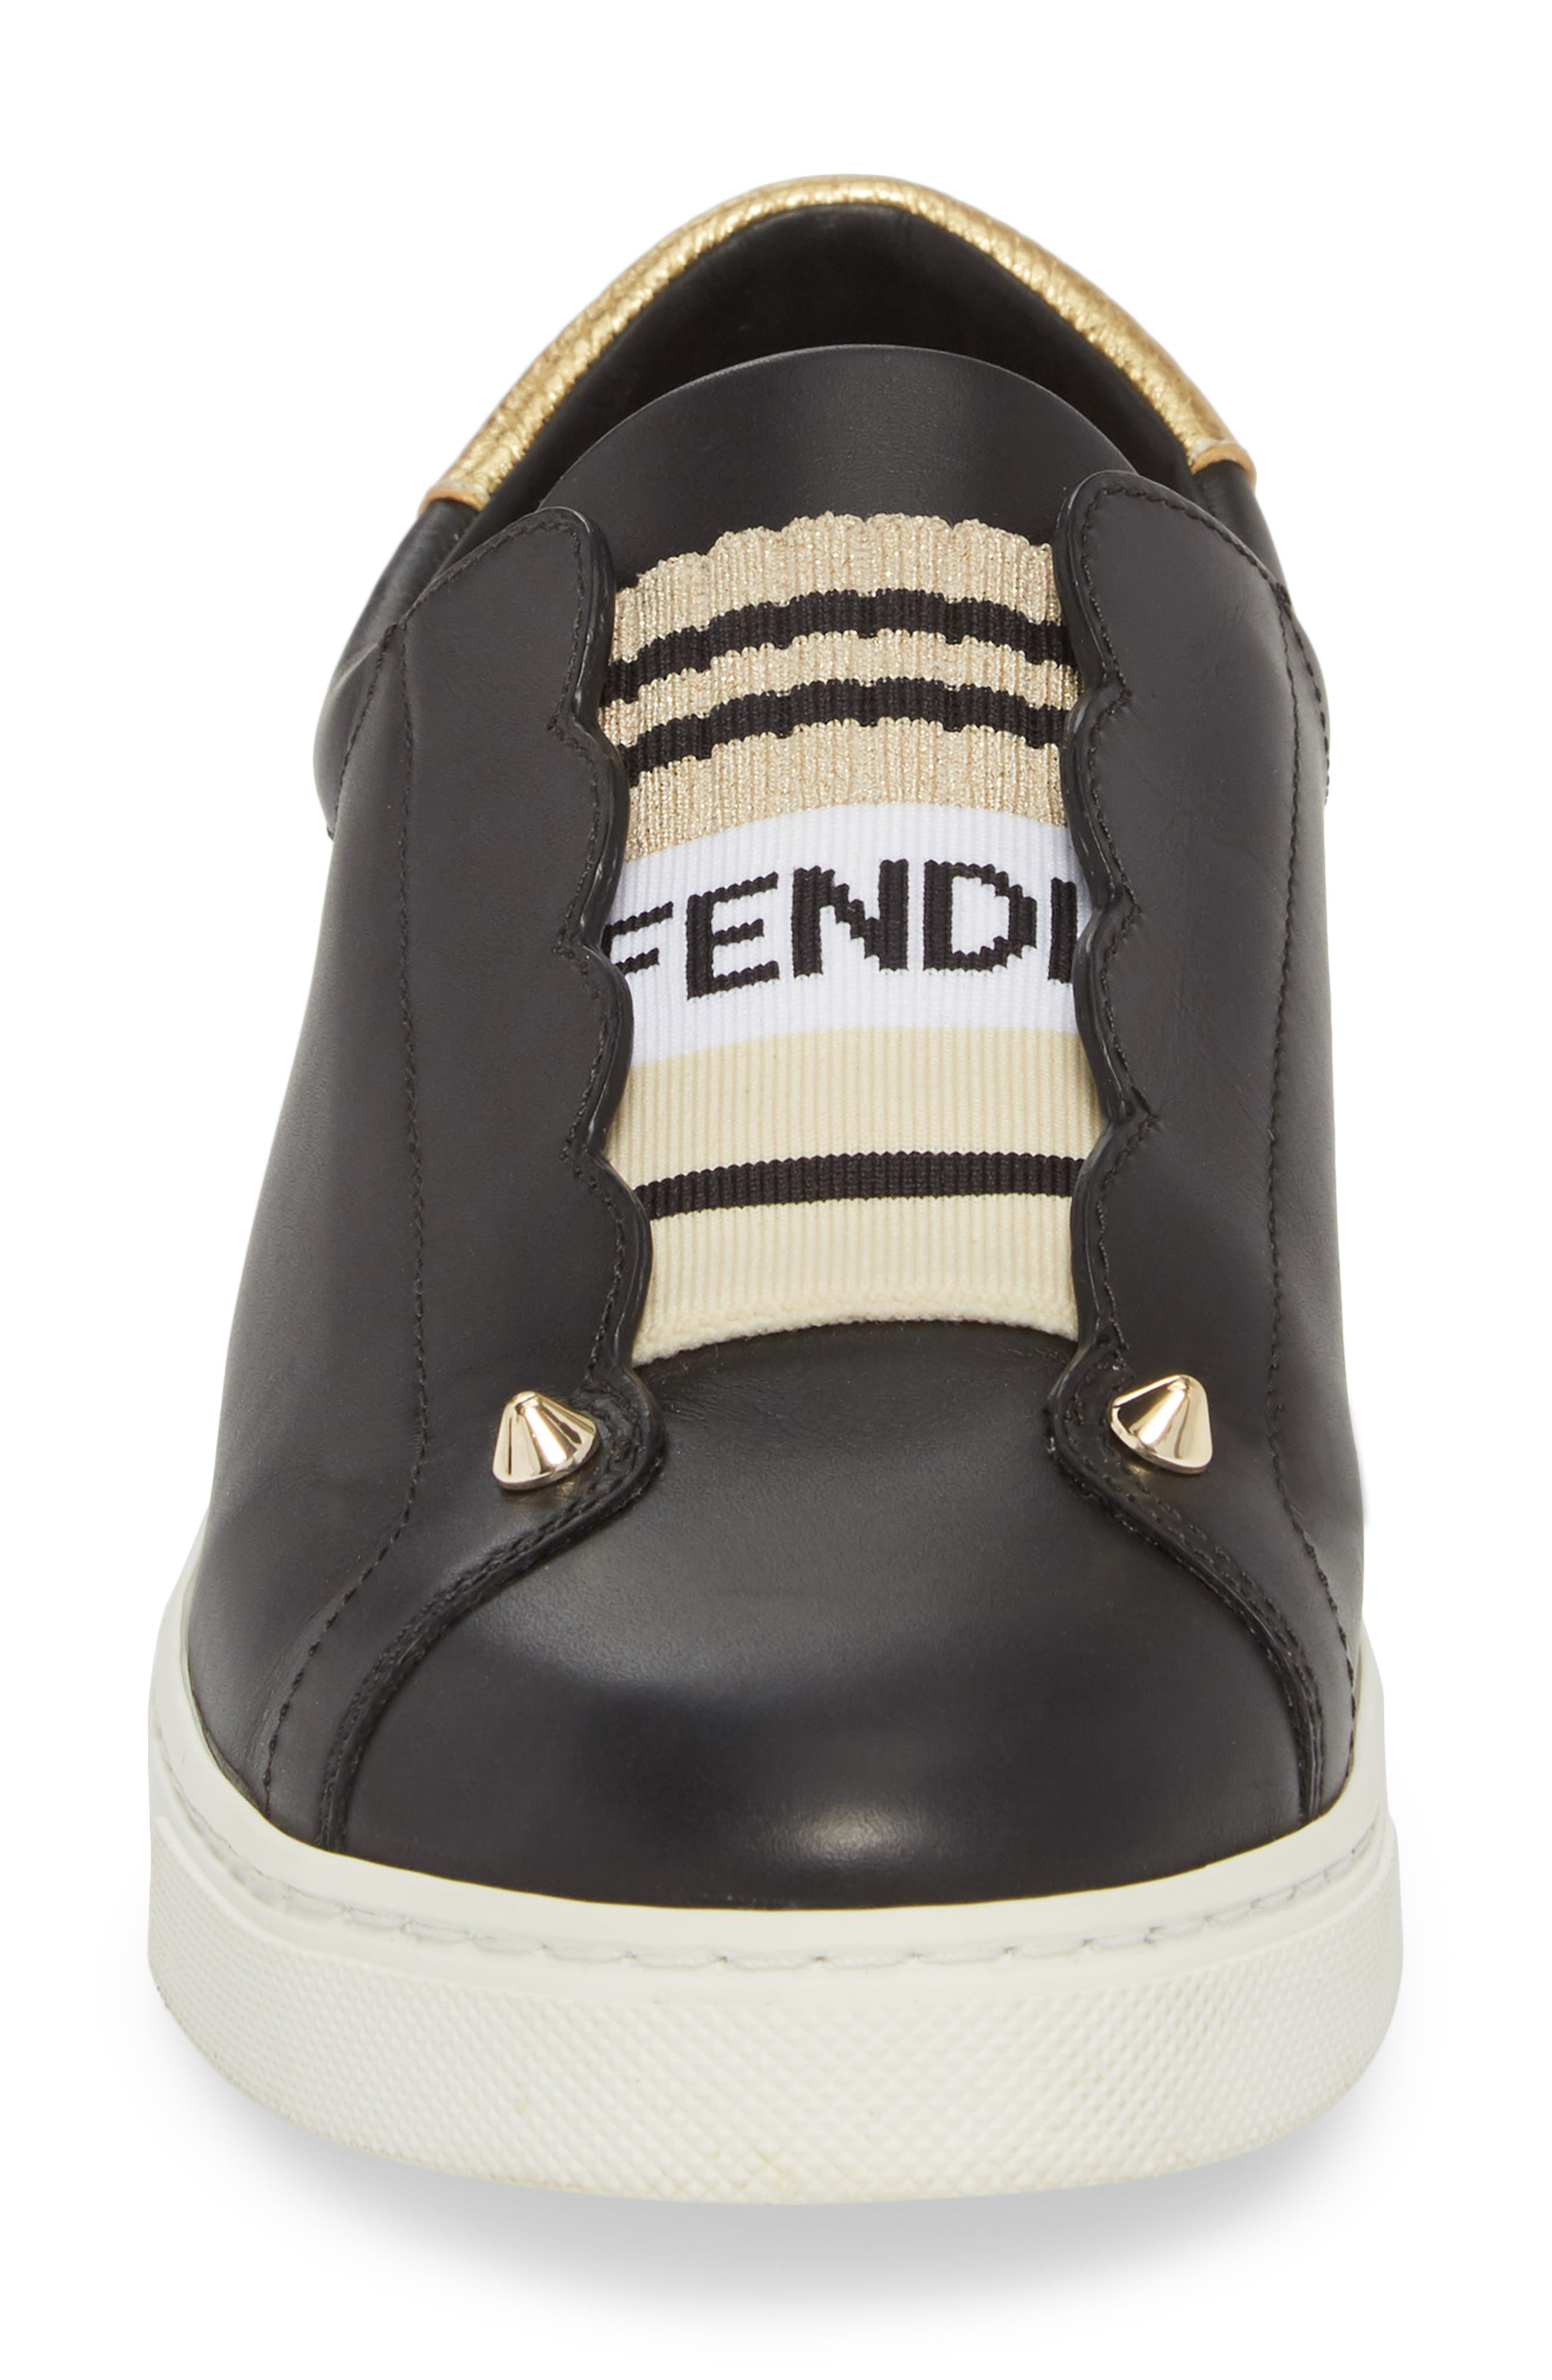 Rockoclick Slip-On Sneaker,                             Alternate thumbnail 4, color,                             BLACK